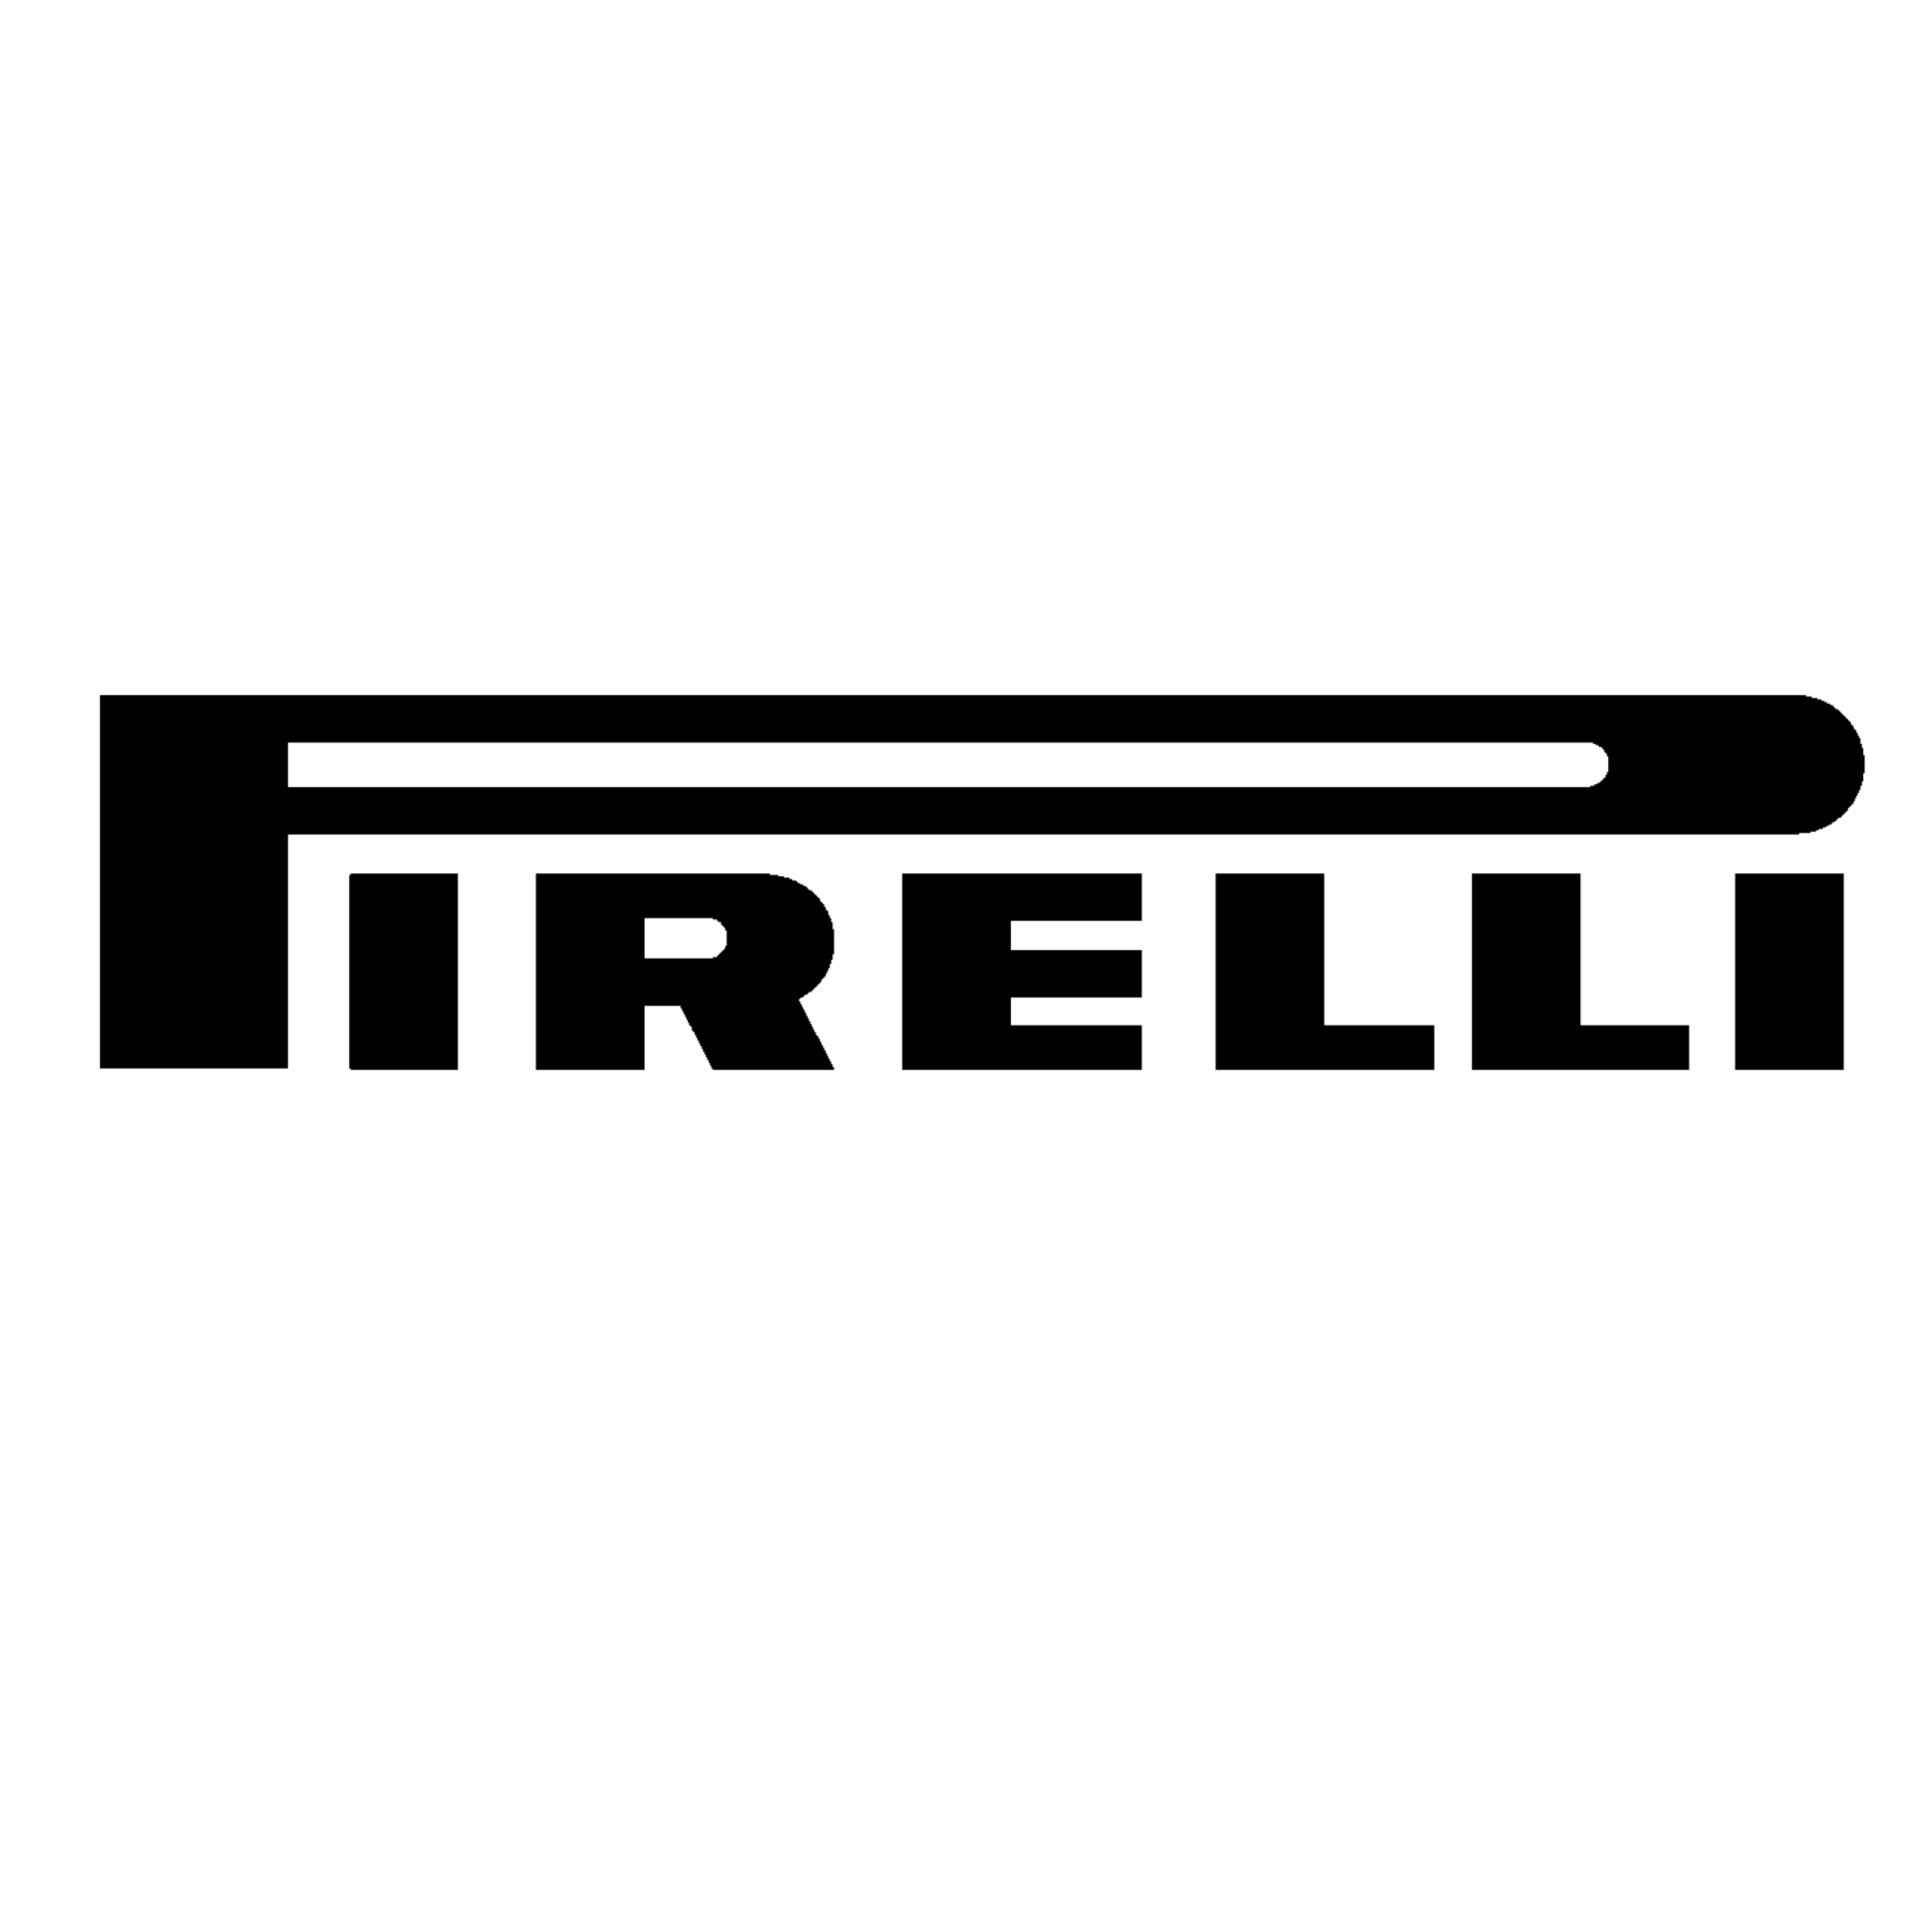 Pirelli RIB's